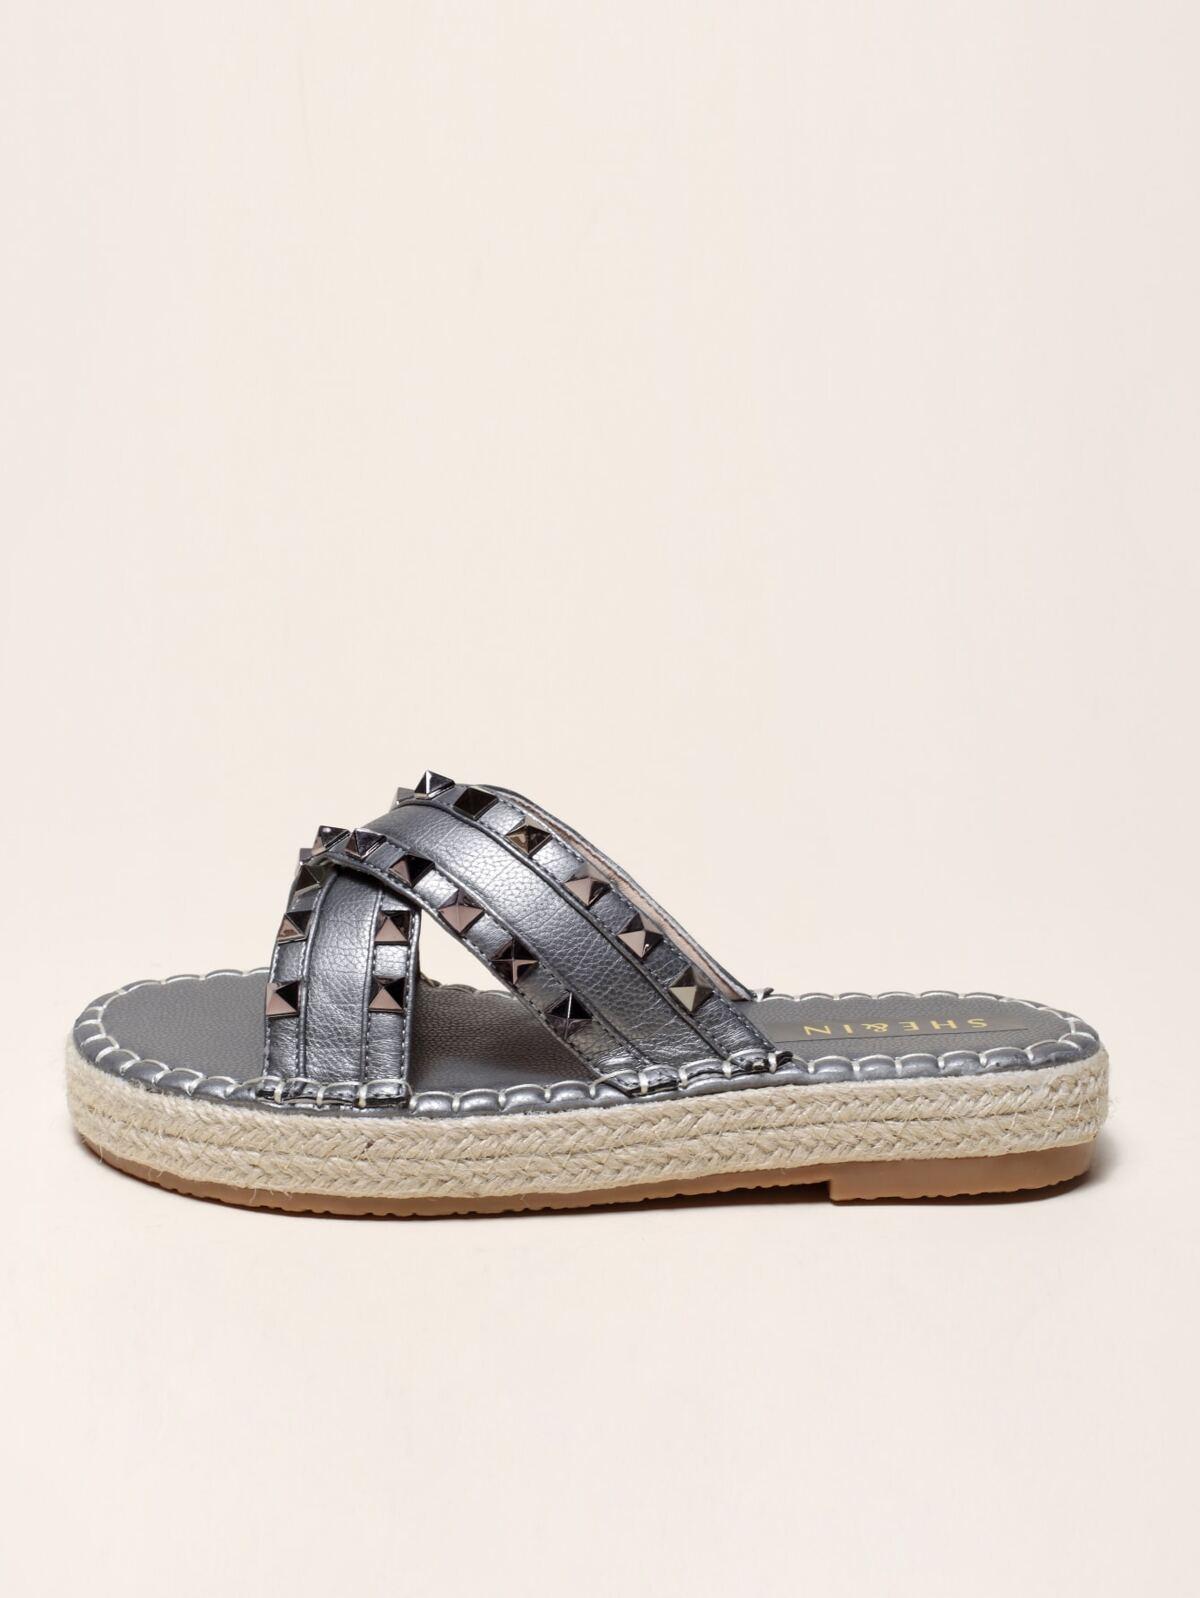 Rivet Decor Criss Cross Espadrille Sandals